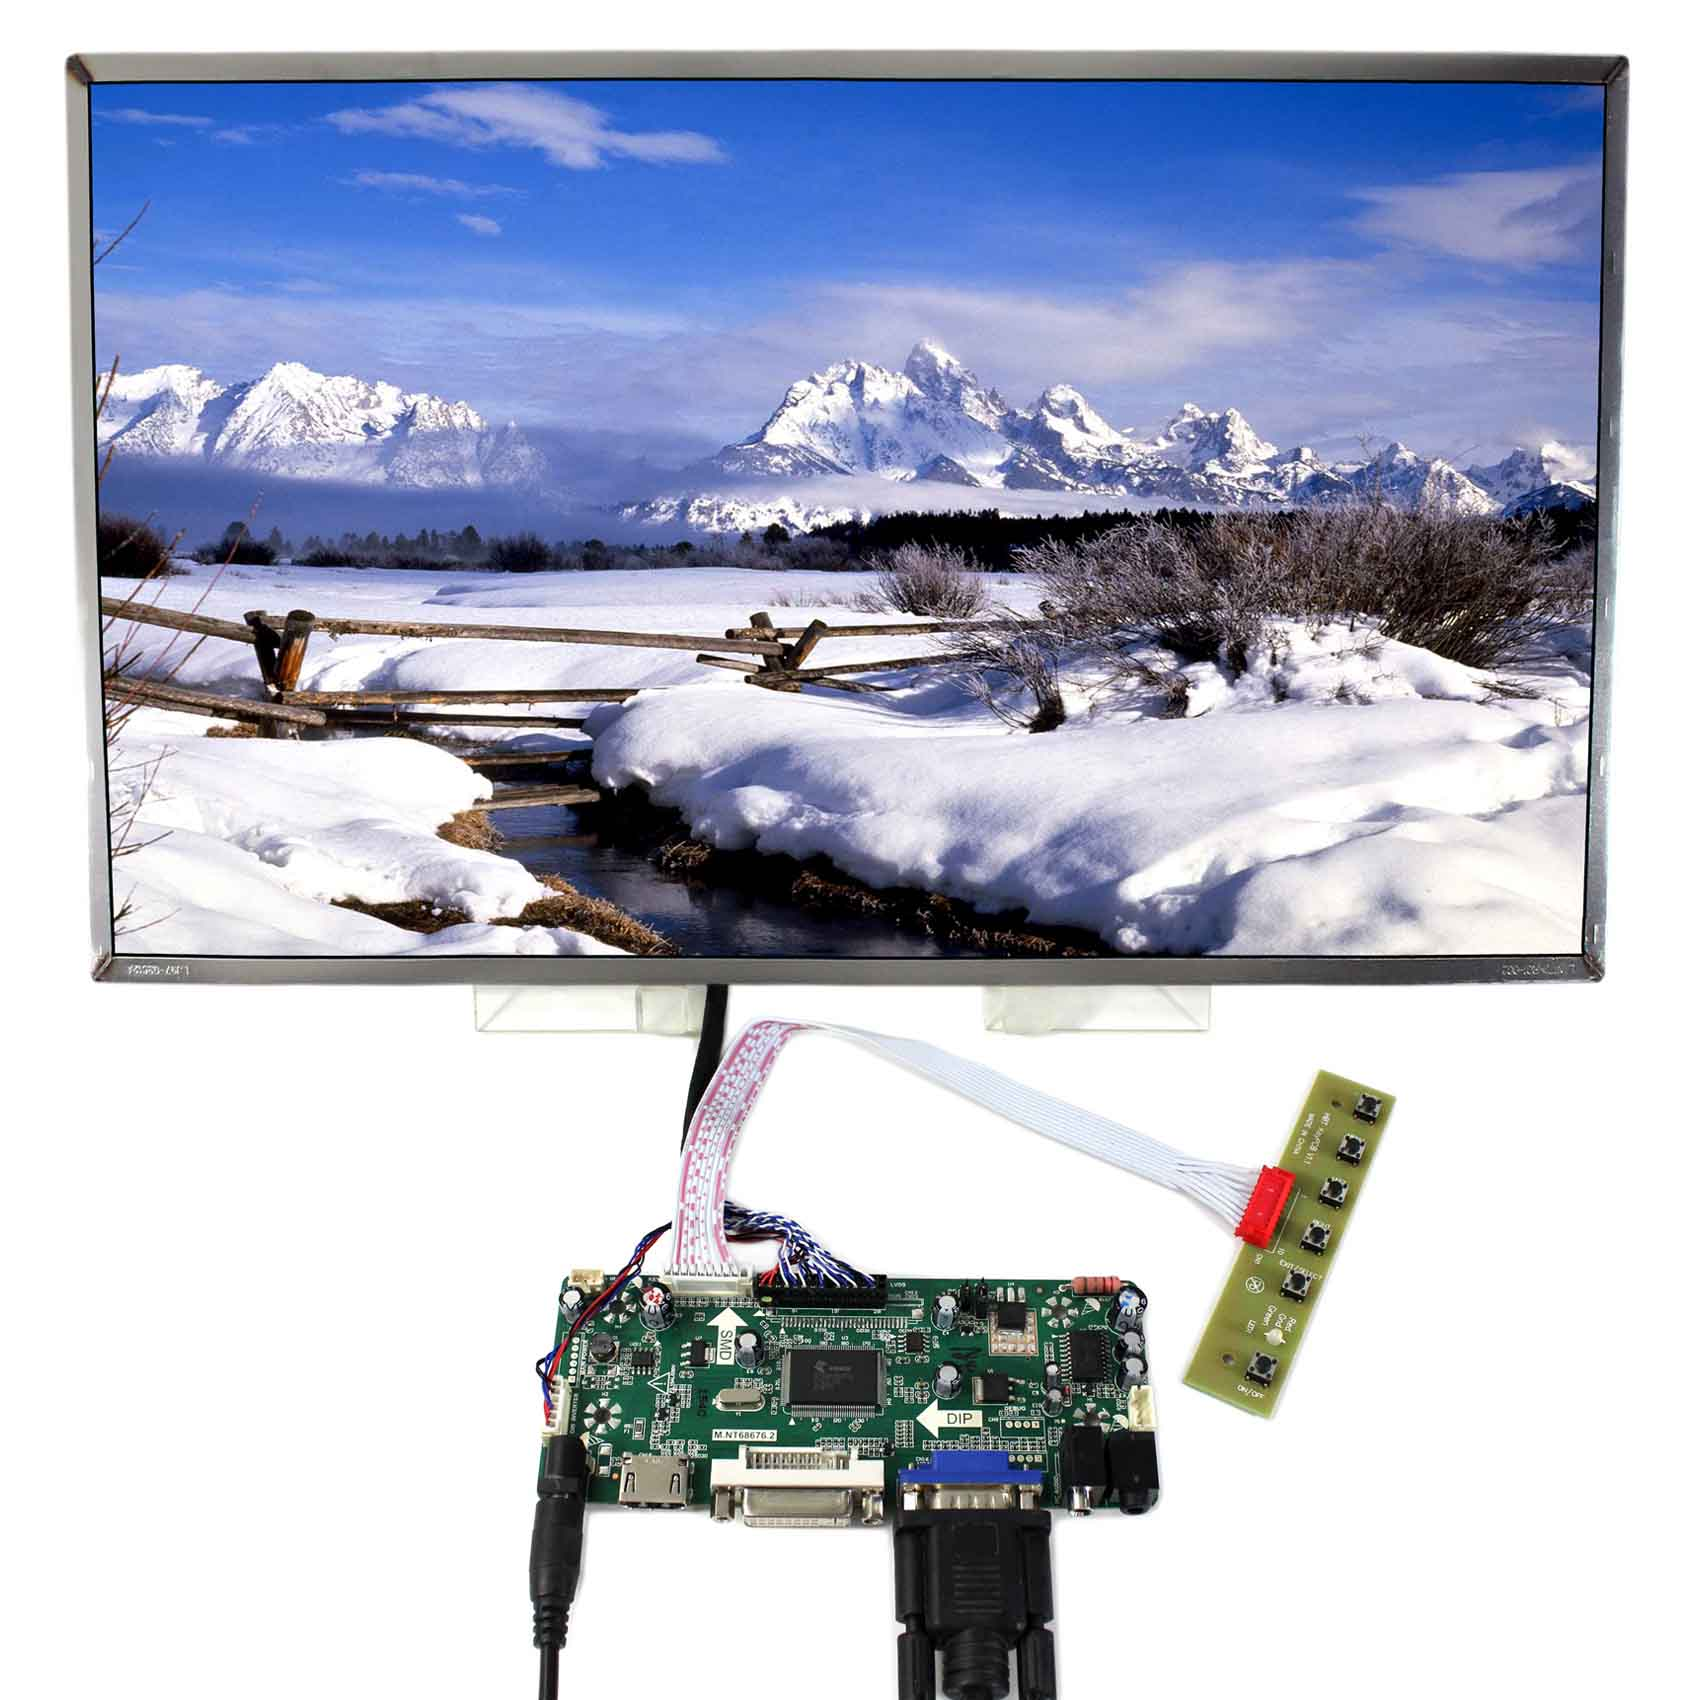 HDMI DVI VGA SES LCD Denetleyici Kurulu + 17.3 LP173WF1 1920x1080 LCD EkranHDMI DVI VGA SES LCD Denetleyici Kurulu + 17.3 LP173WF1 1920x1080 LCD Ekran